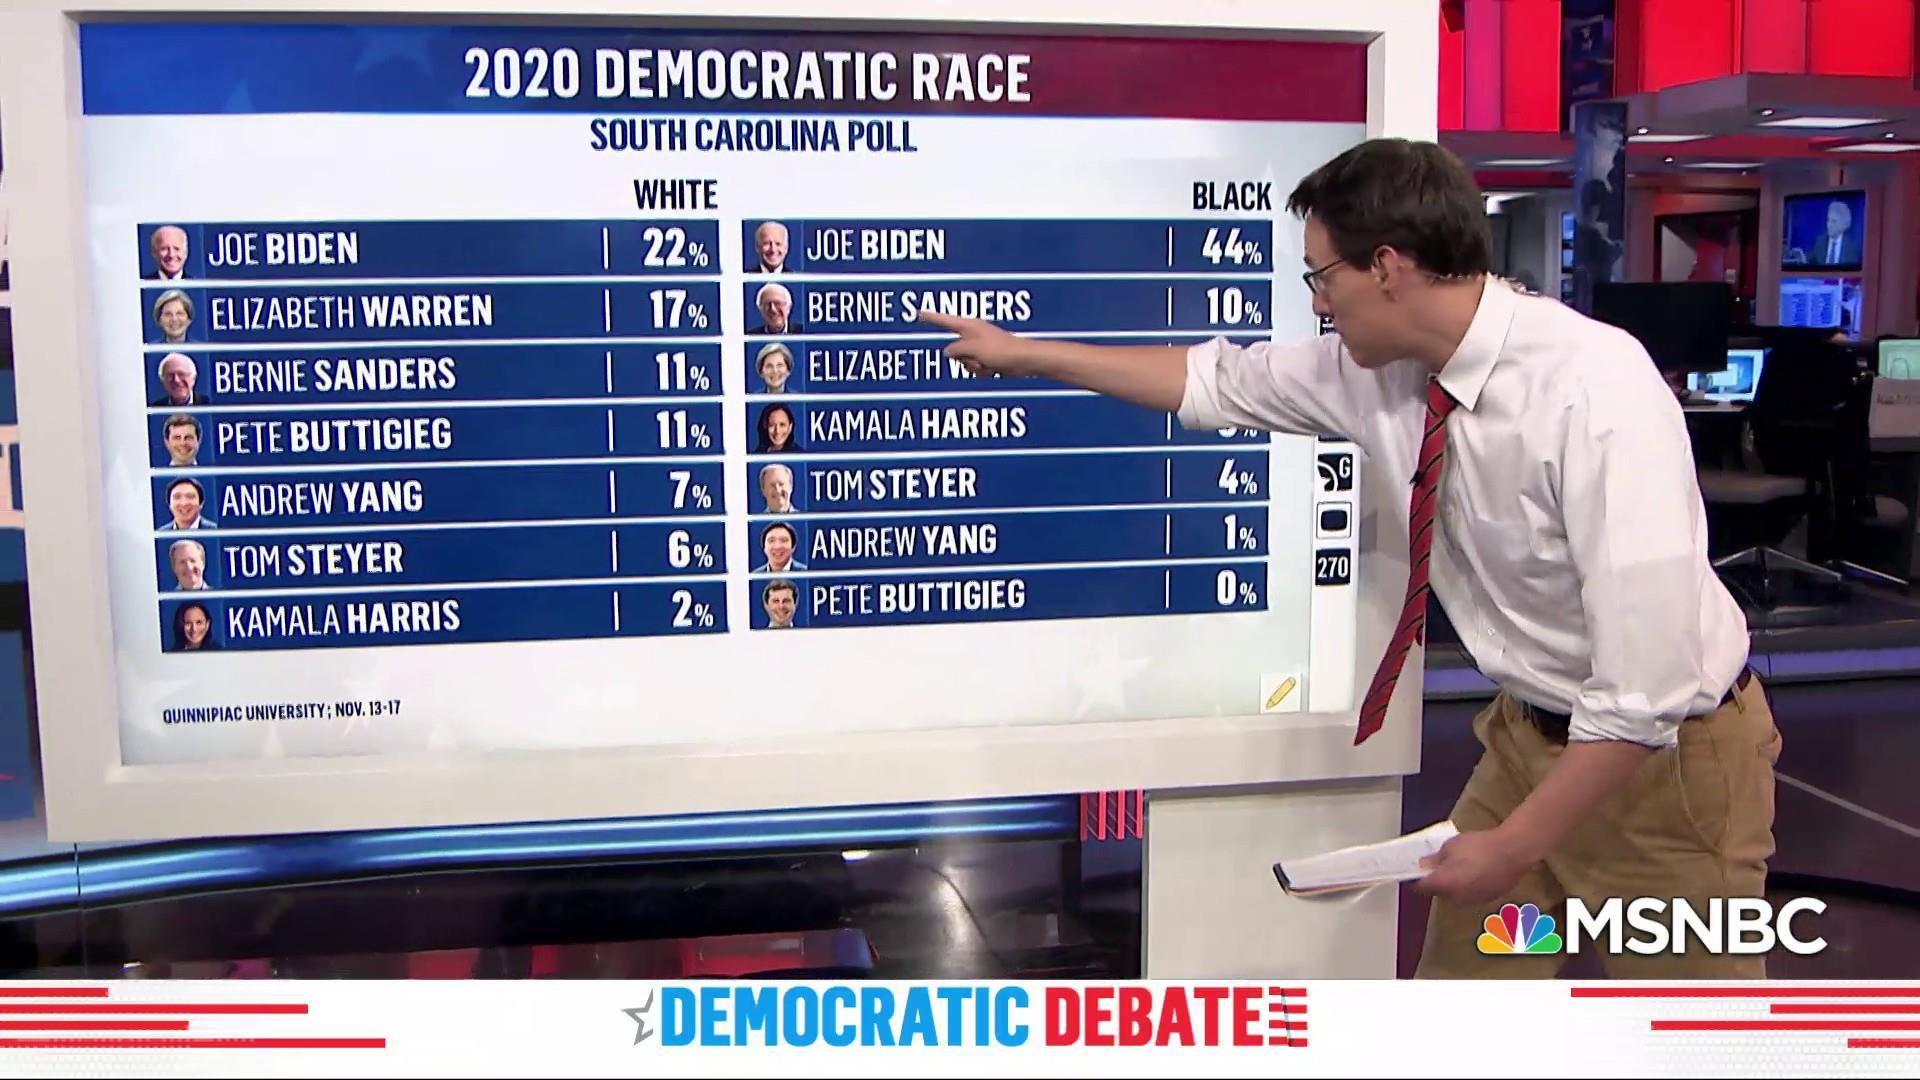 Despite awkward moments, Biden leads with the black vote